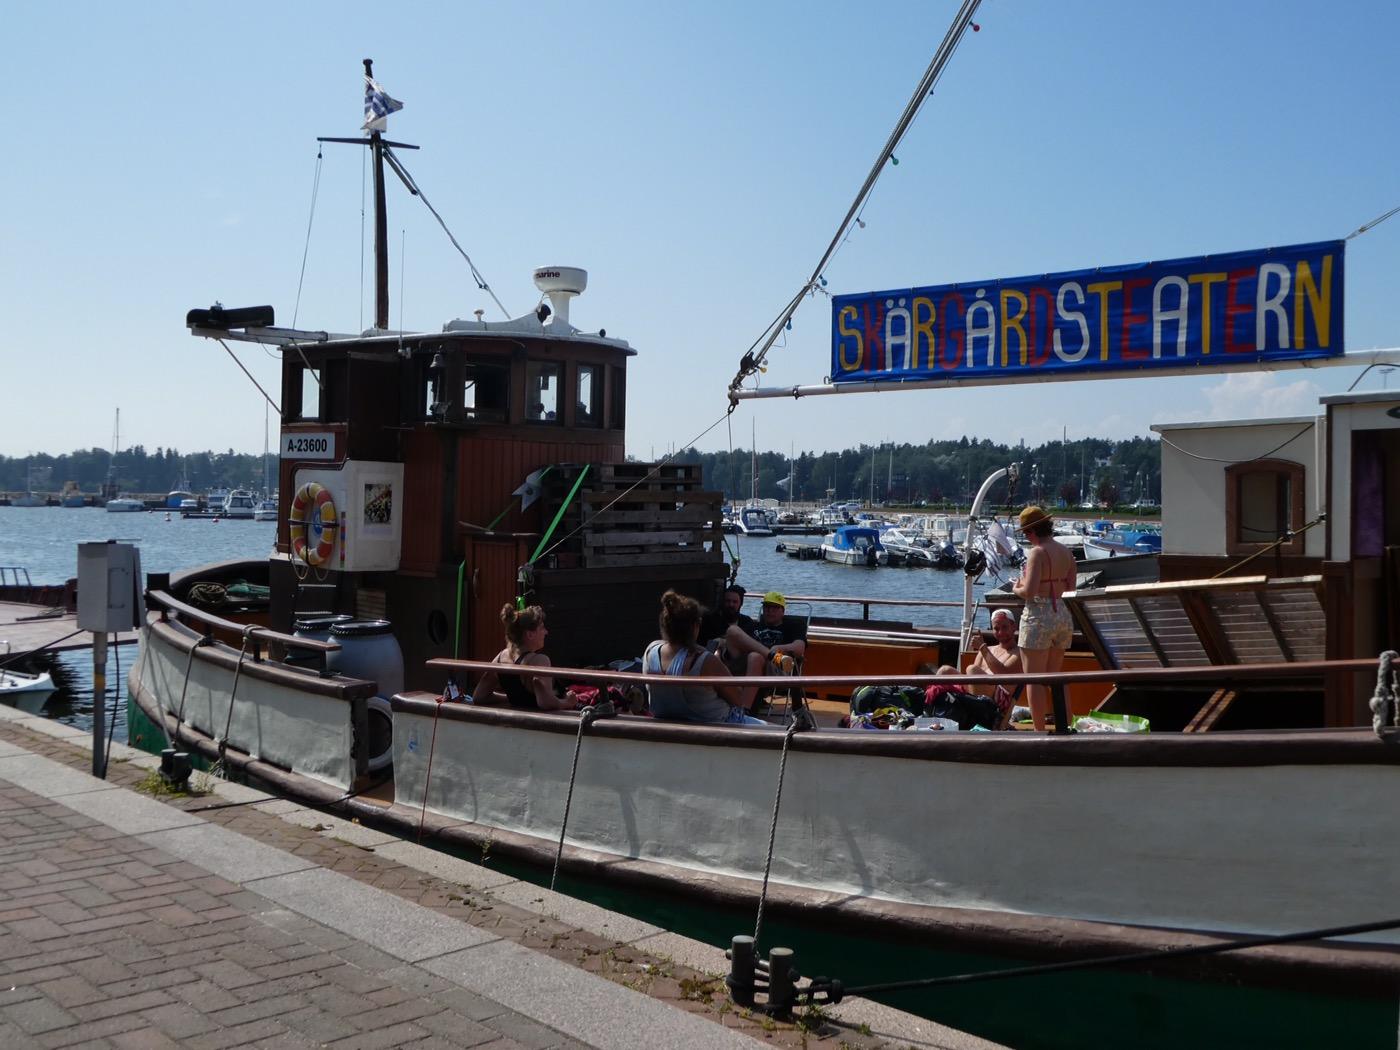 Theatre boat moored at Herttoniemi, Helsinki